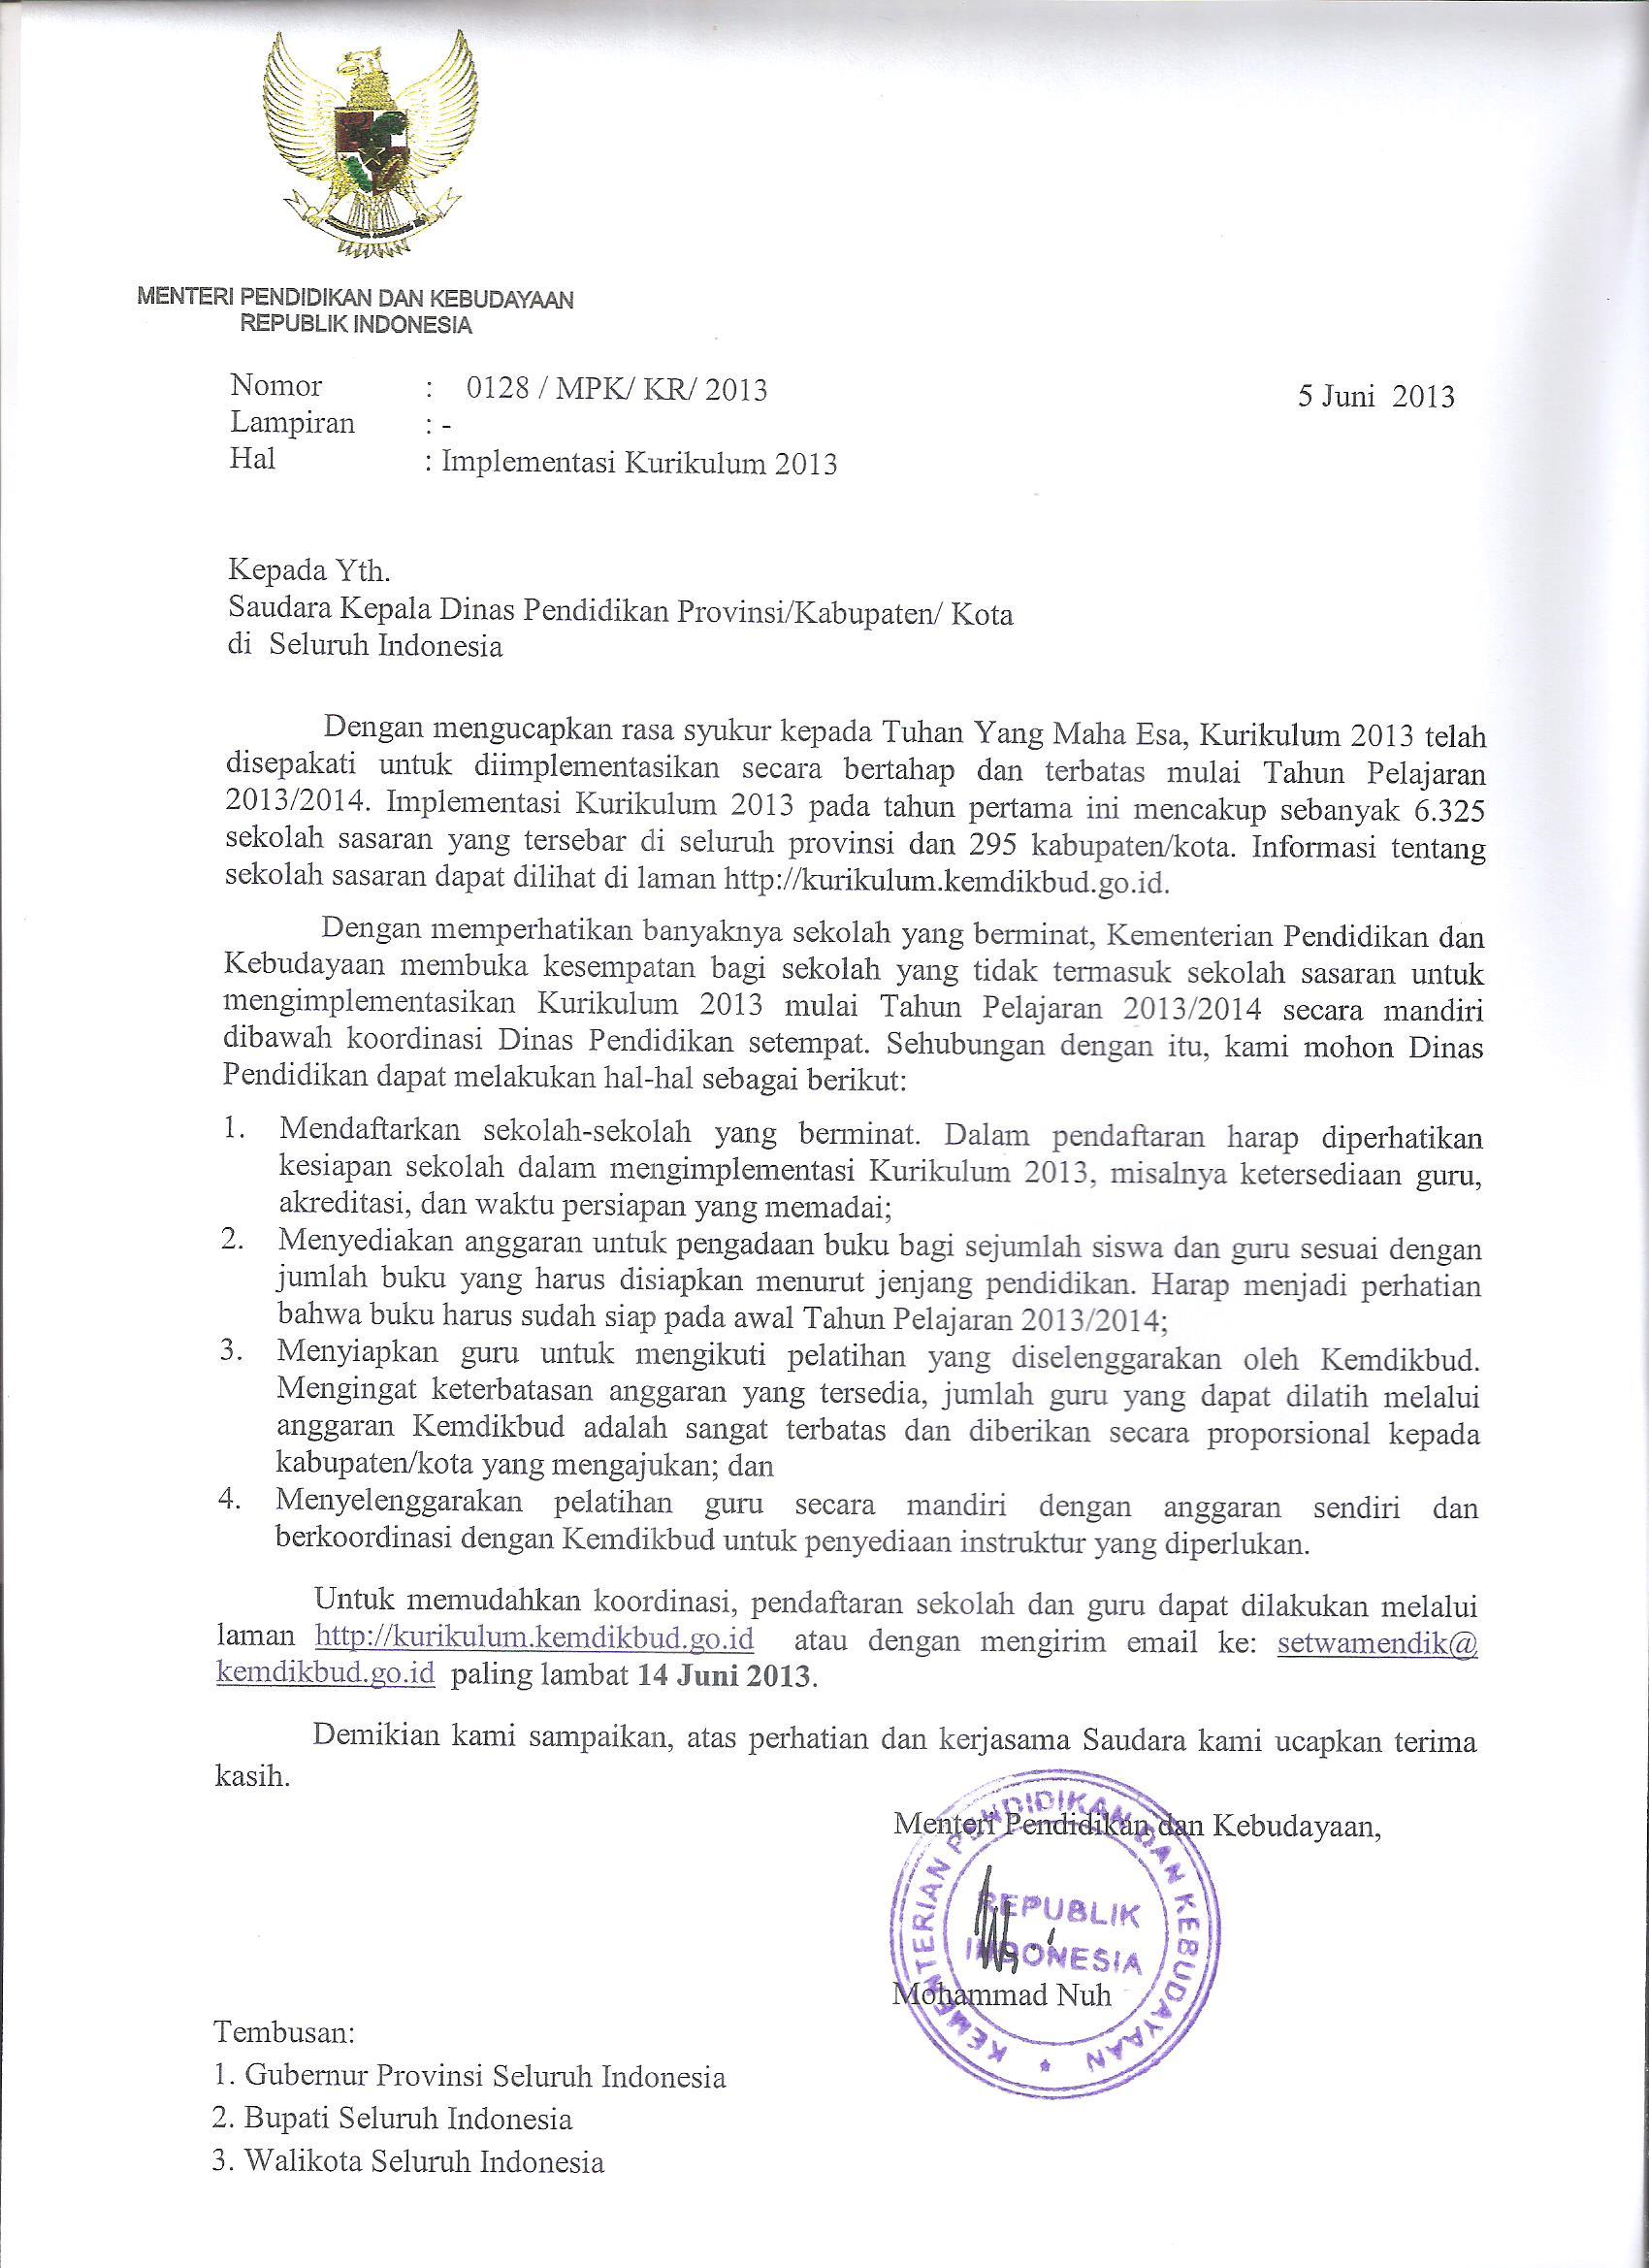 Surat Mendikbud Tentang Implementasi Kurikulum 2013 Sman 1